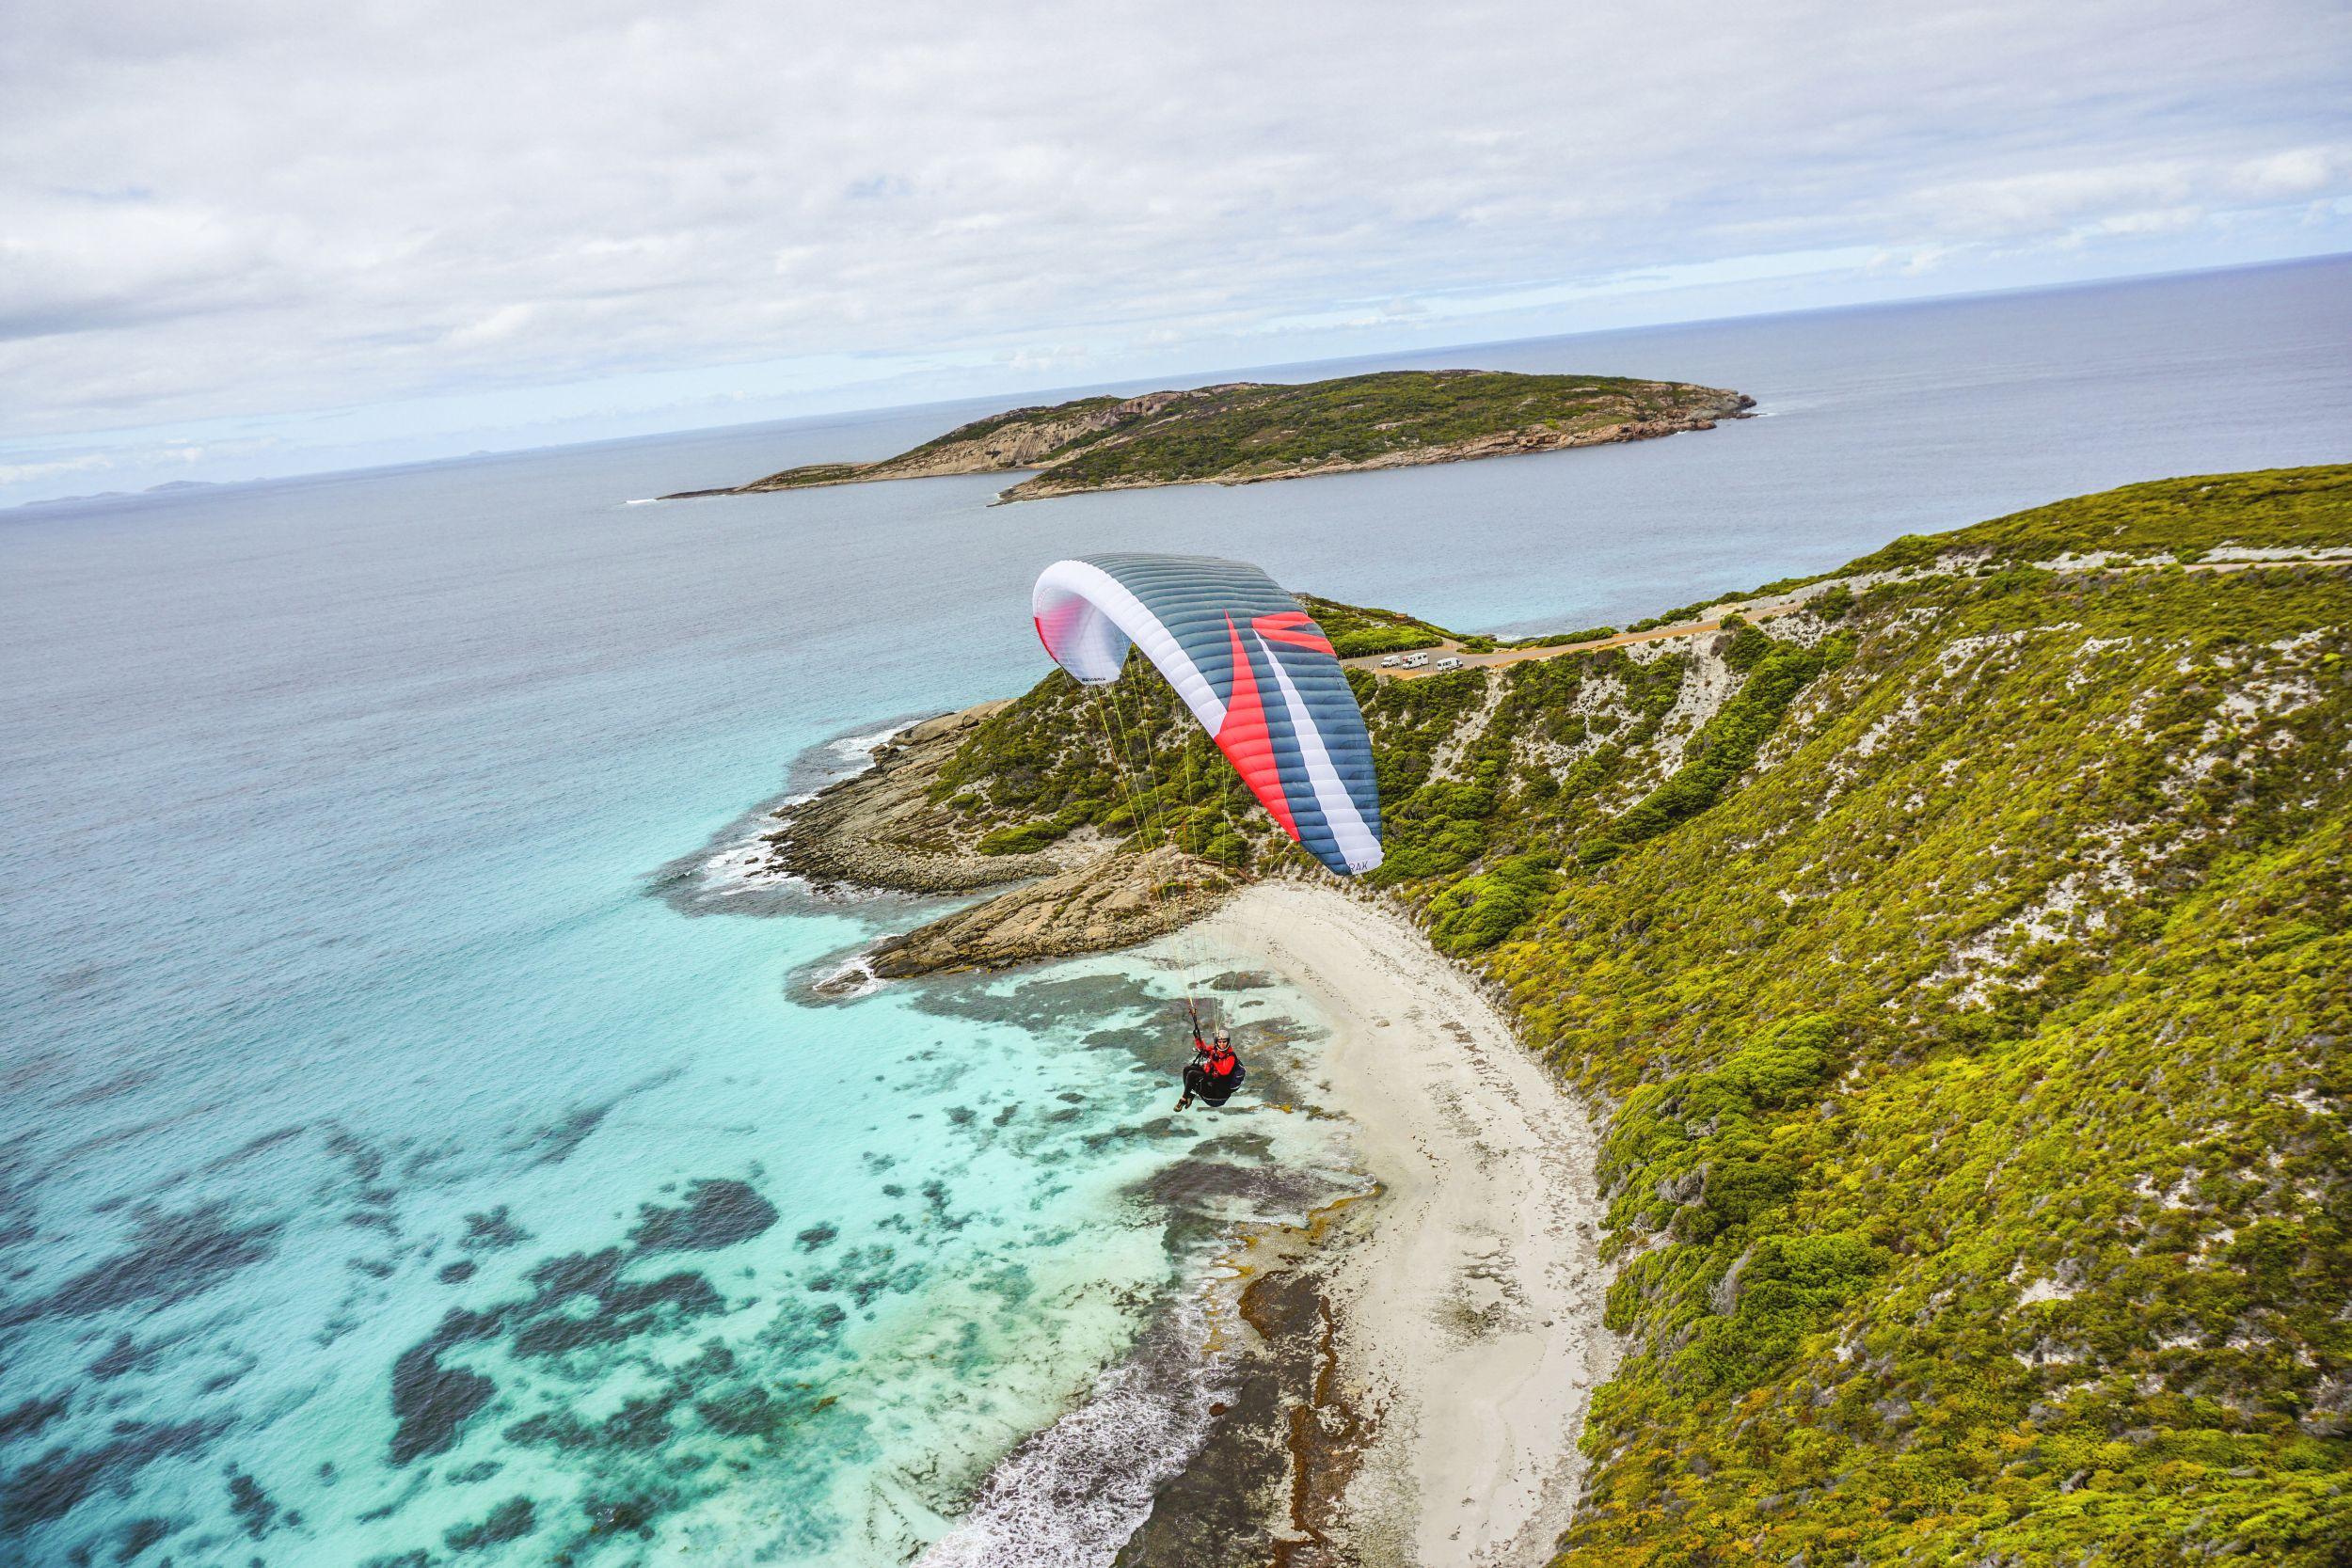 skywalk paragliders - Australien - Travel Blog